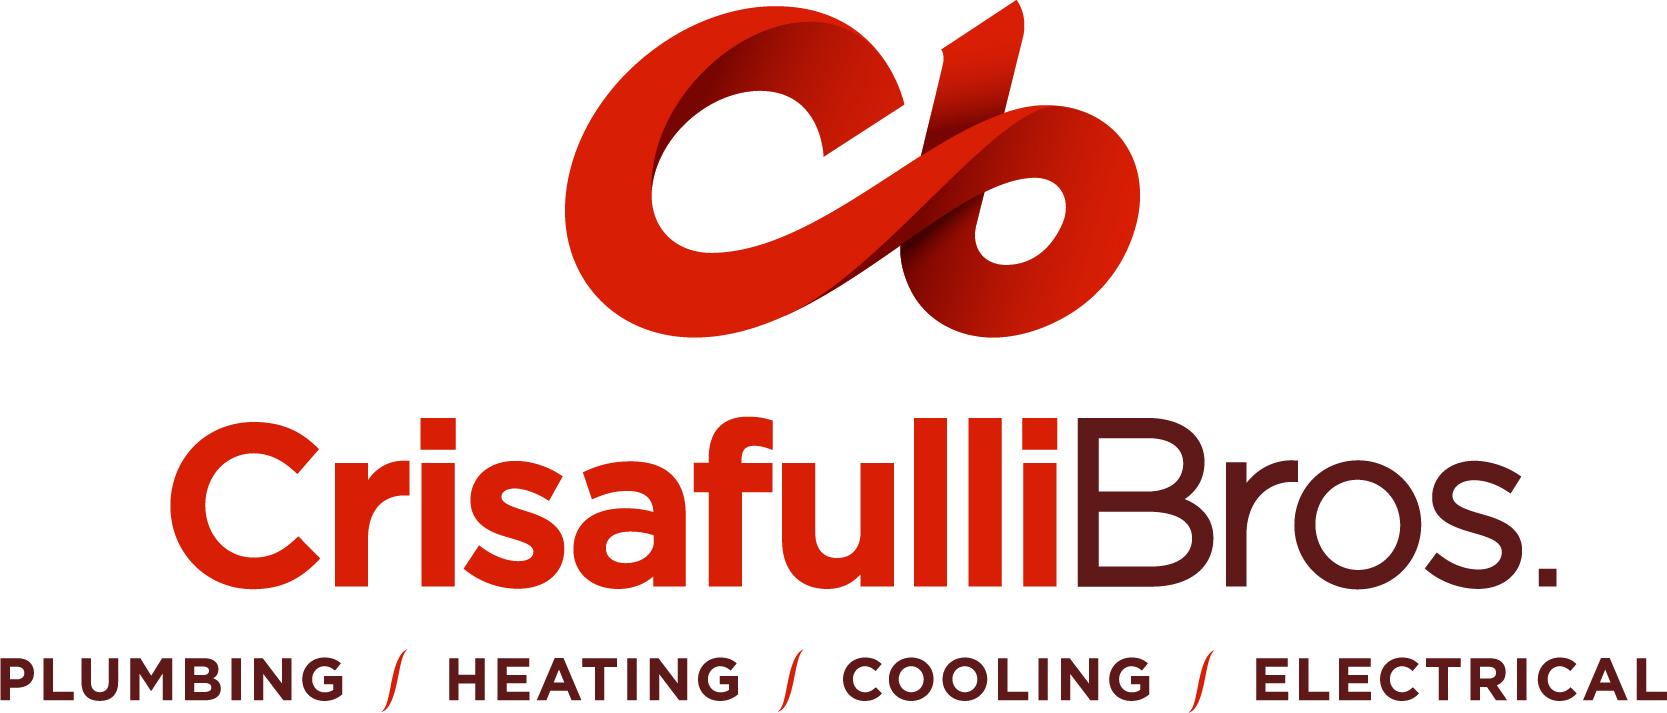 Crisafulli Bros. Plumbing and Heating Contractors, Inc. logo